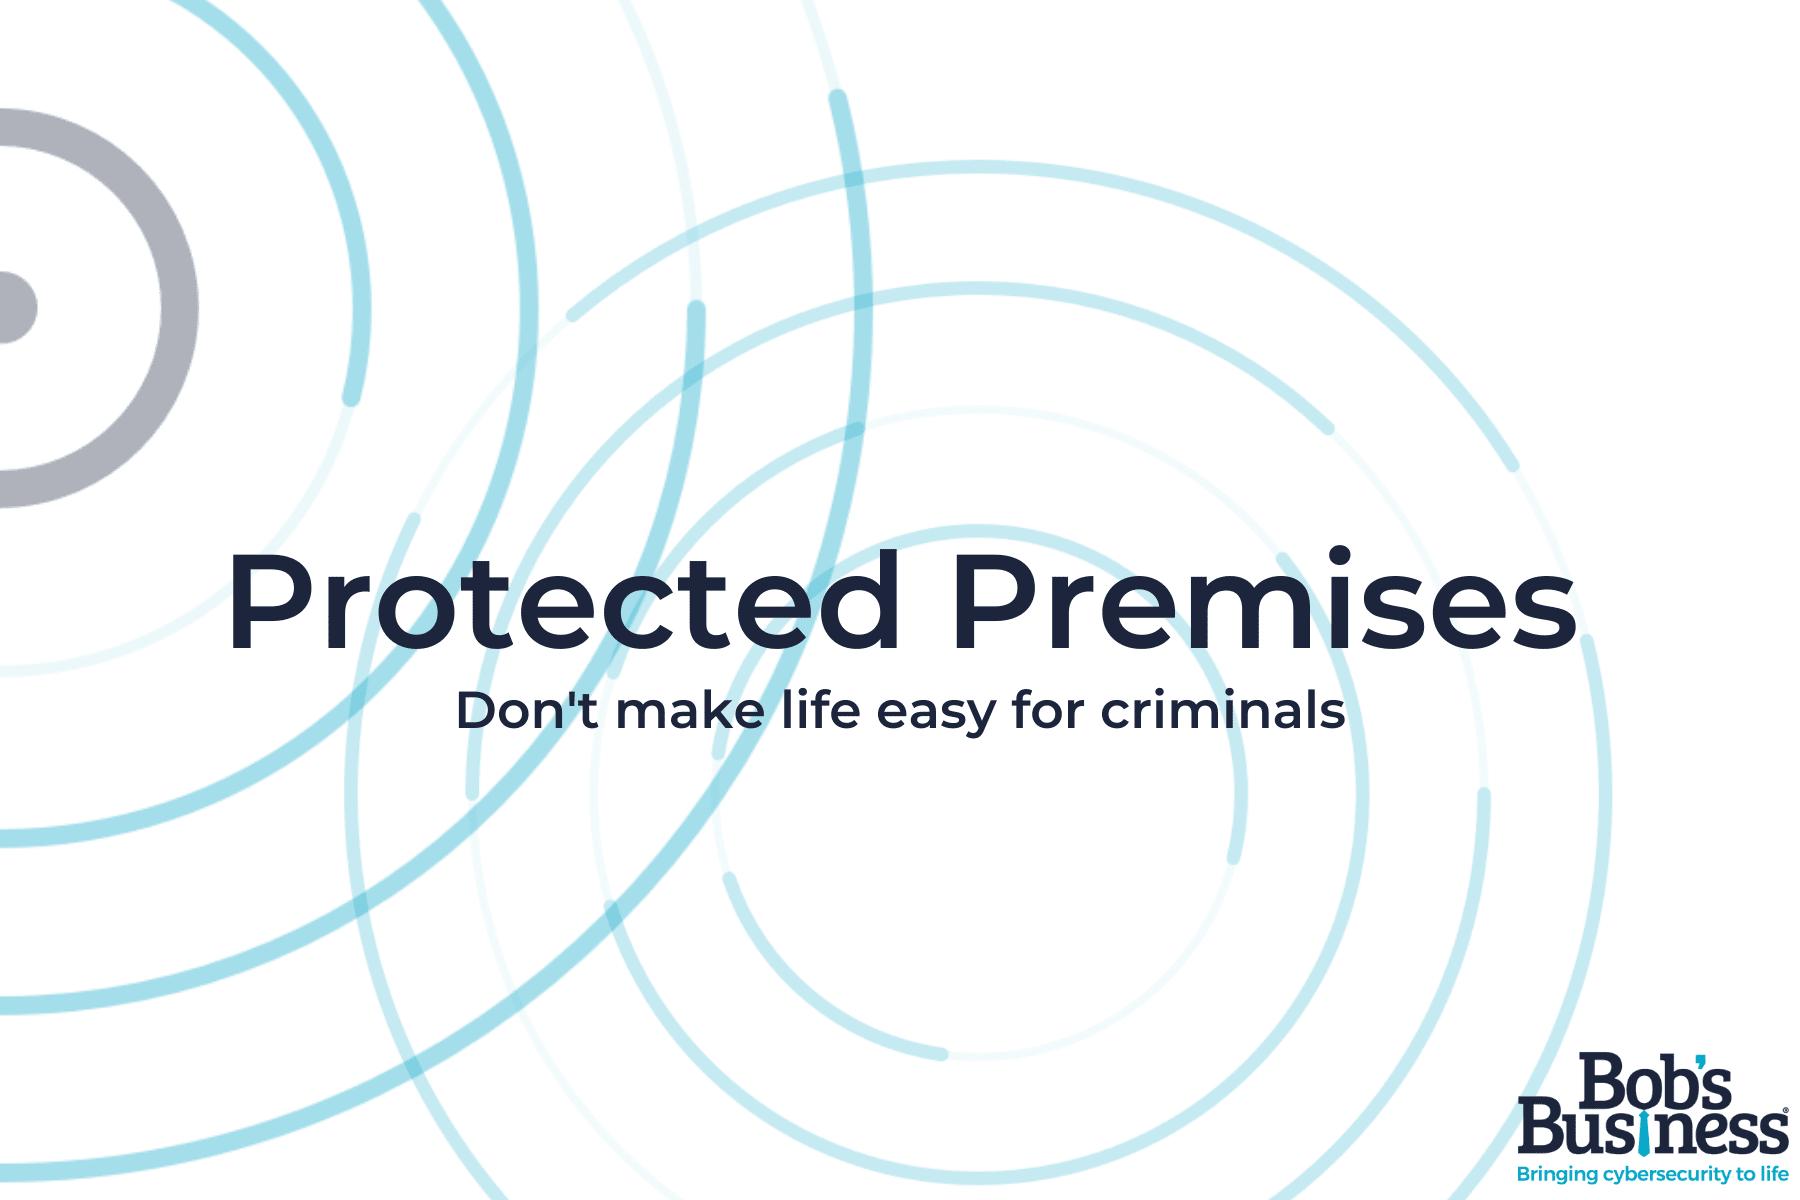 Protected Premises